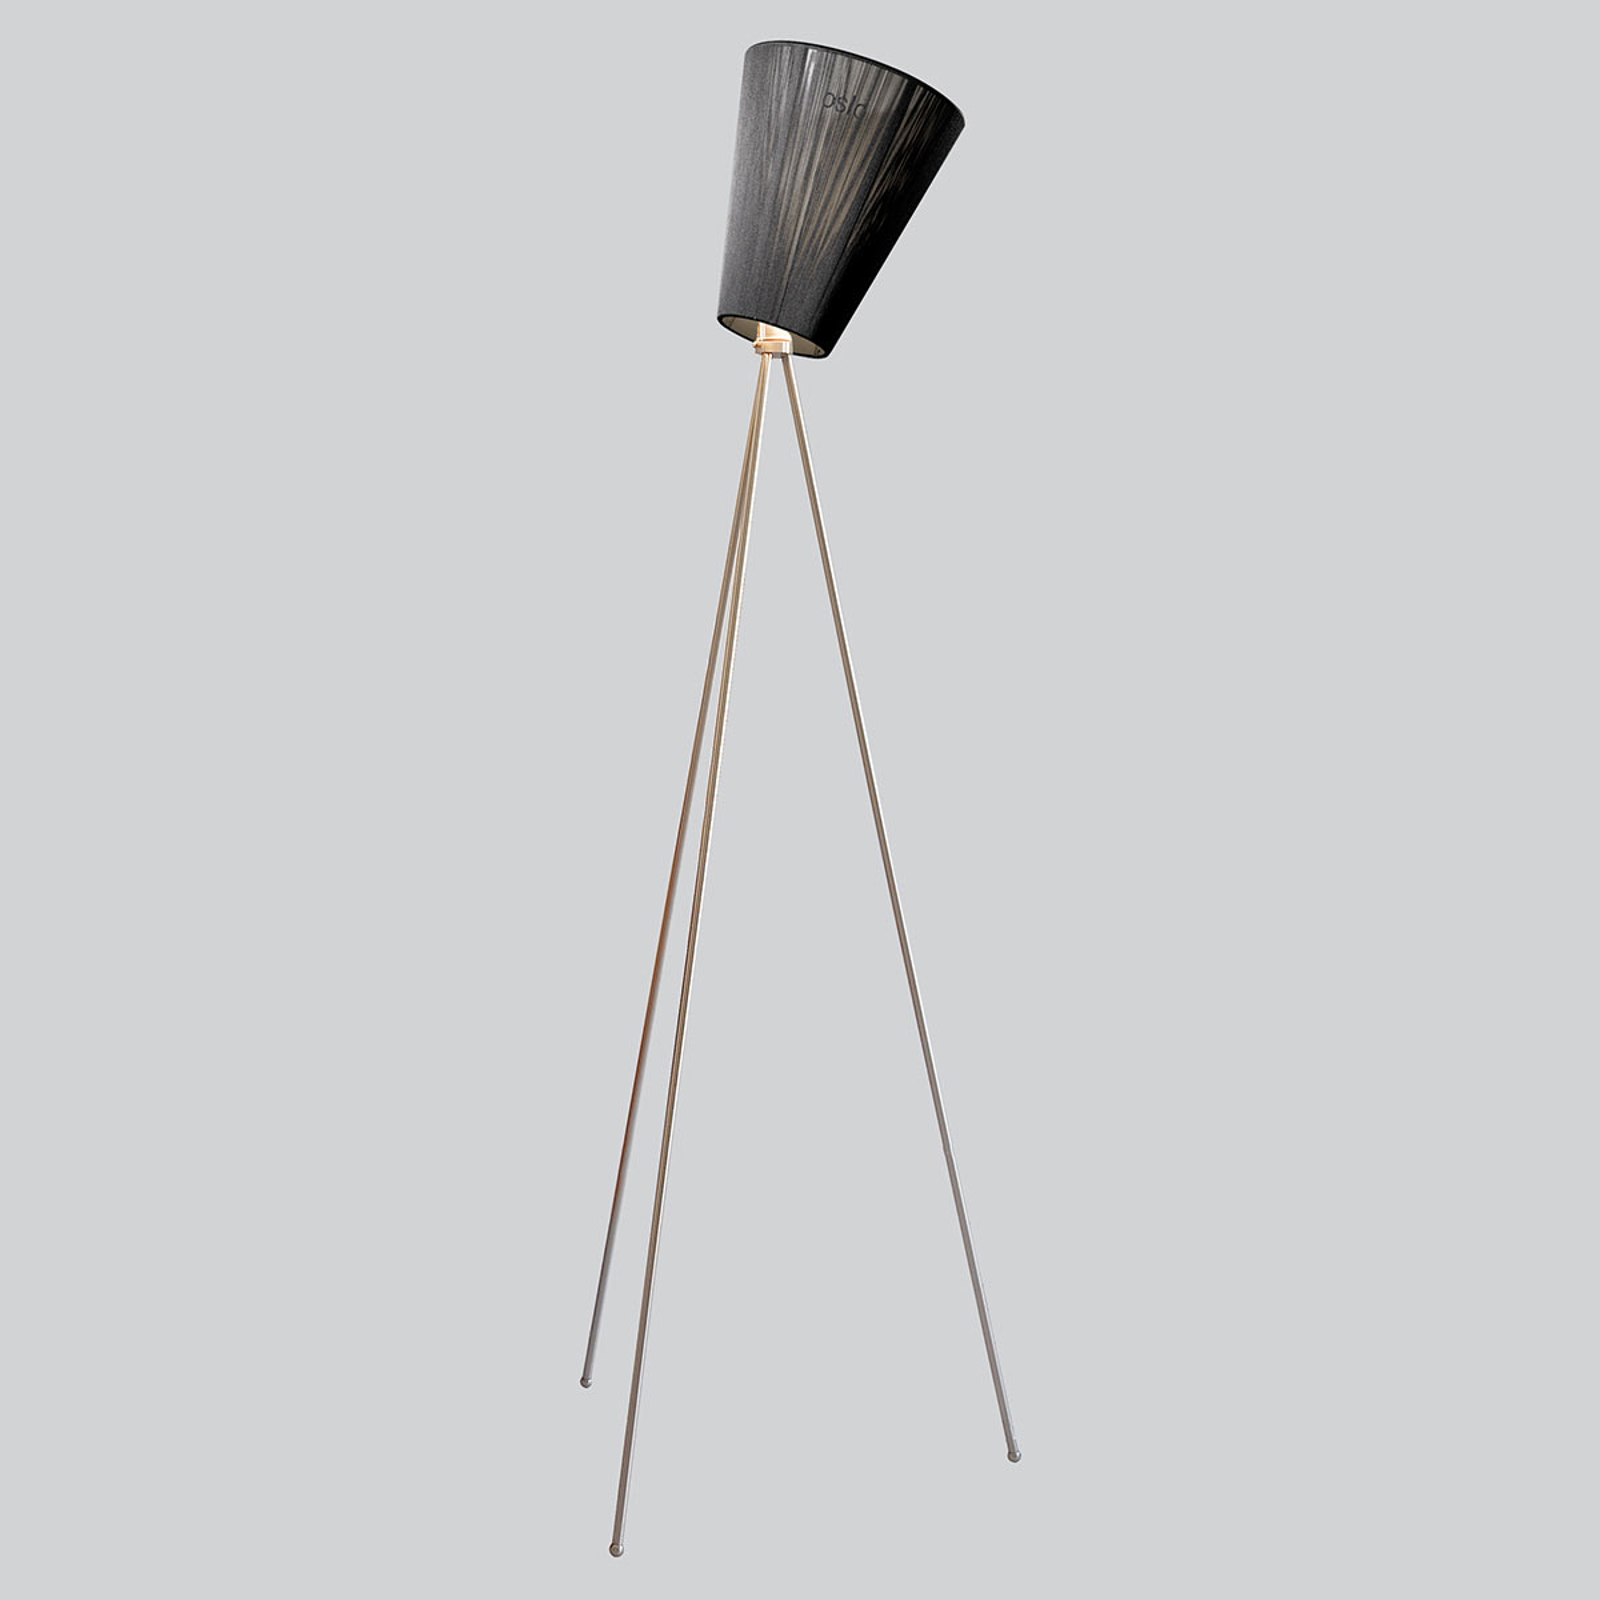 Northern Oslo Wood gulvlampe stål/sort